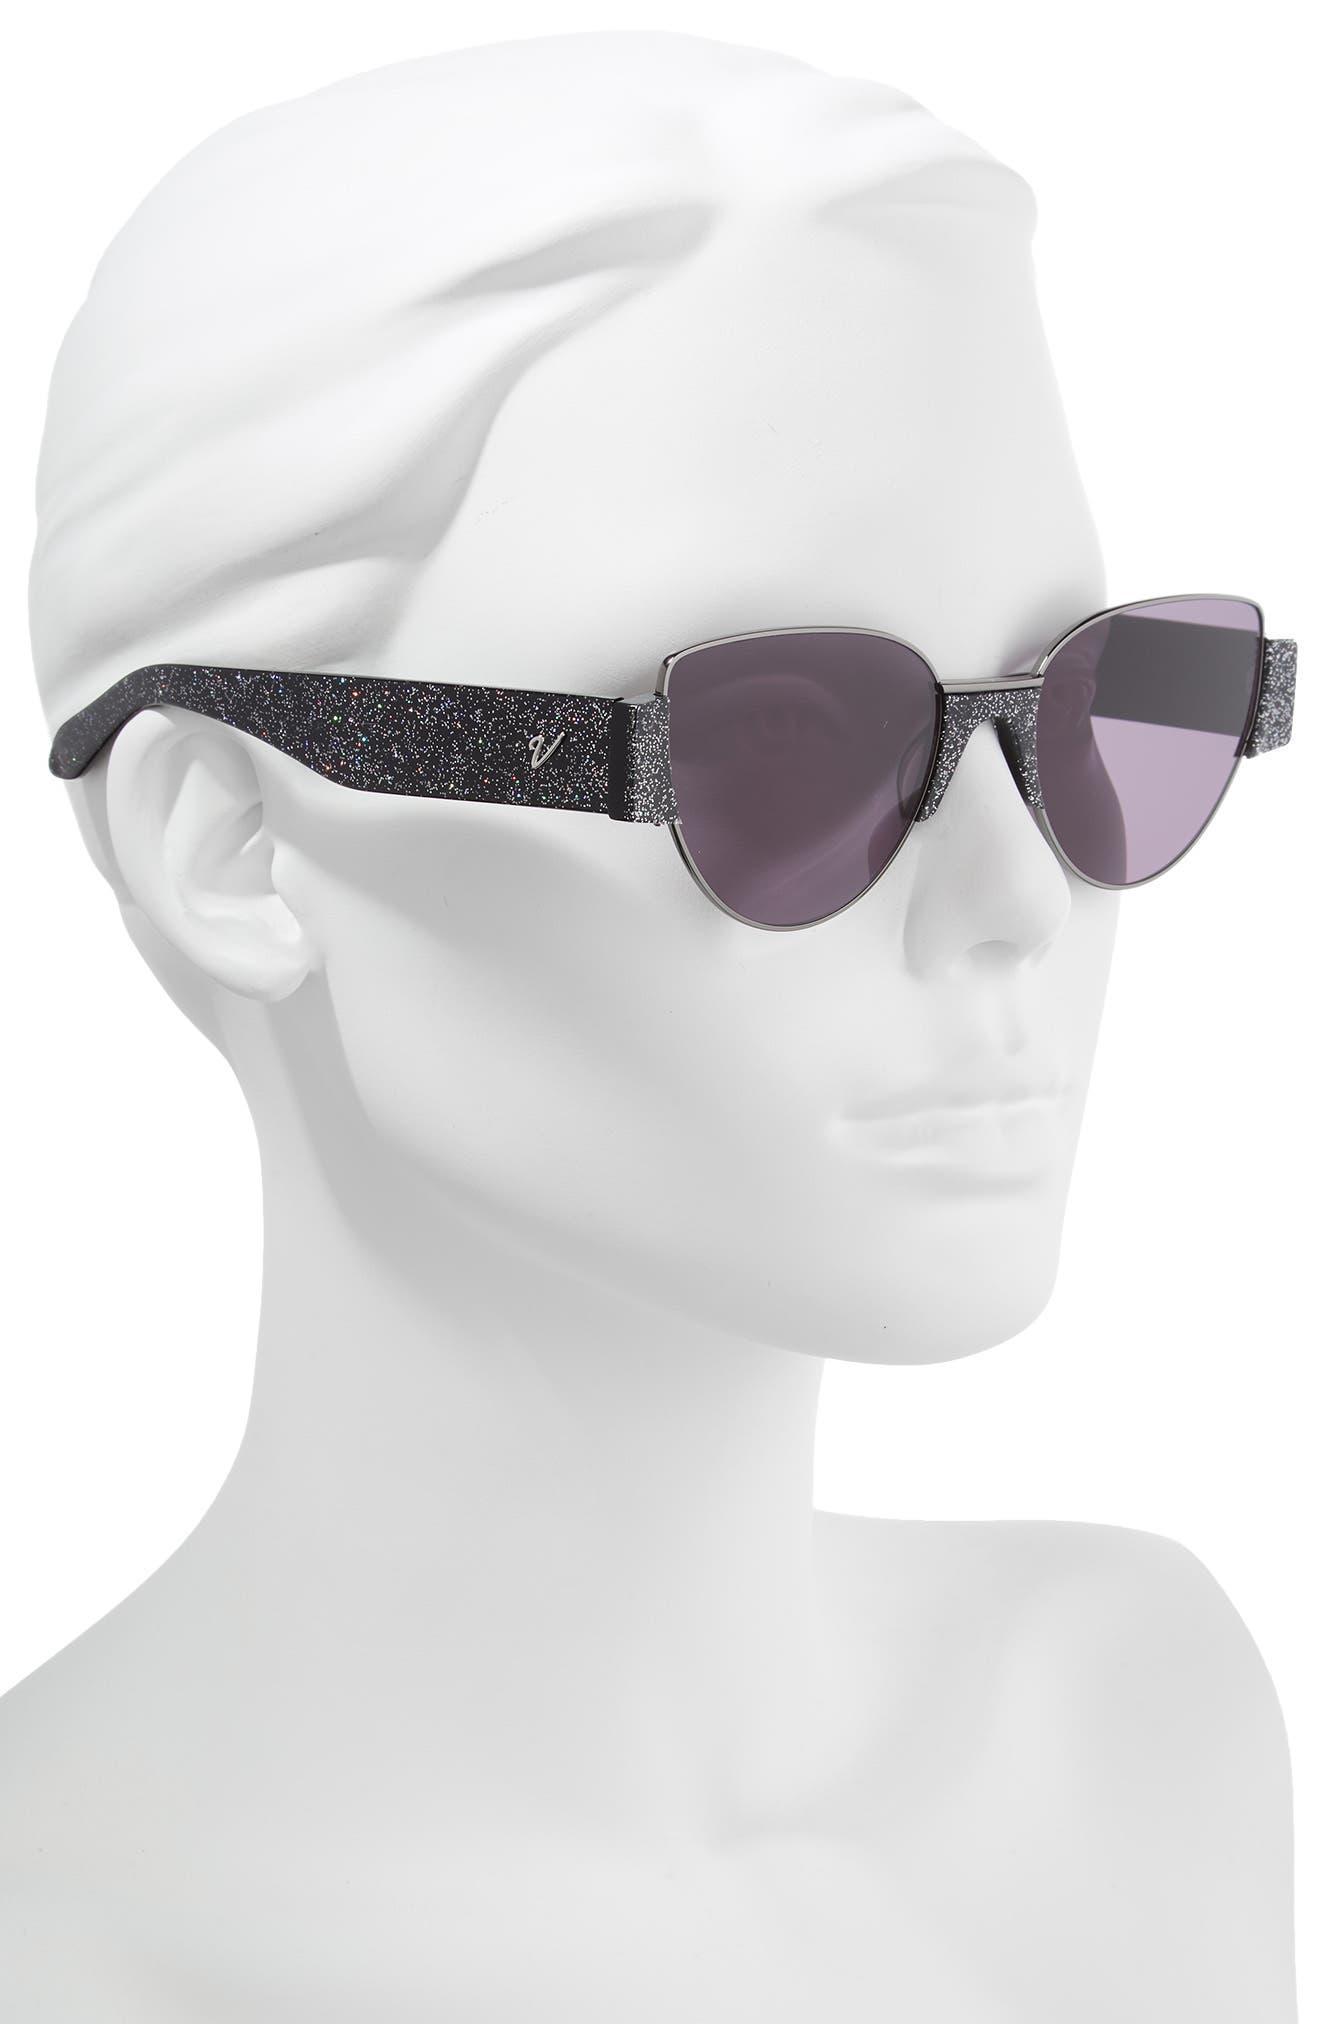 Dahlia 55mm Cat Eye Sunglasses,                             Alternate thumbnail 2, color,                             MULTI GLITTER/ GUNMETAL/ SMOKE